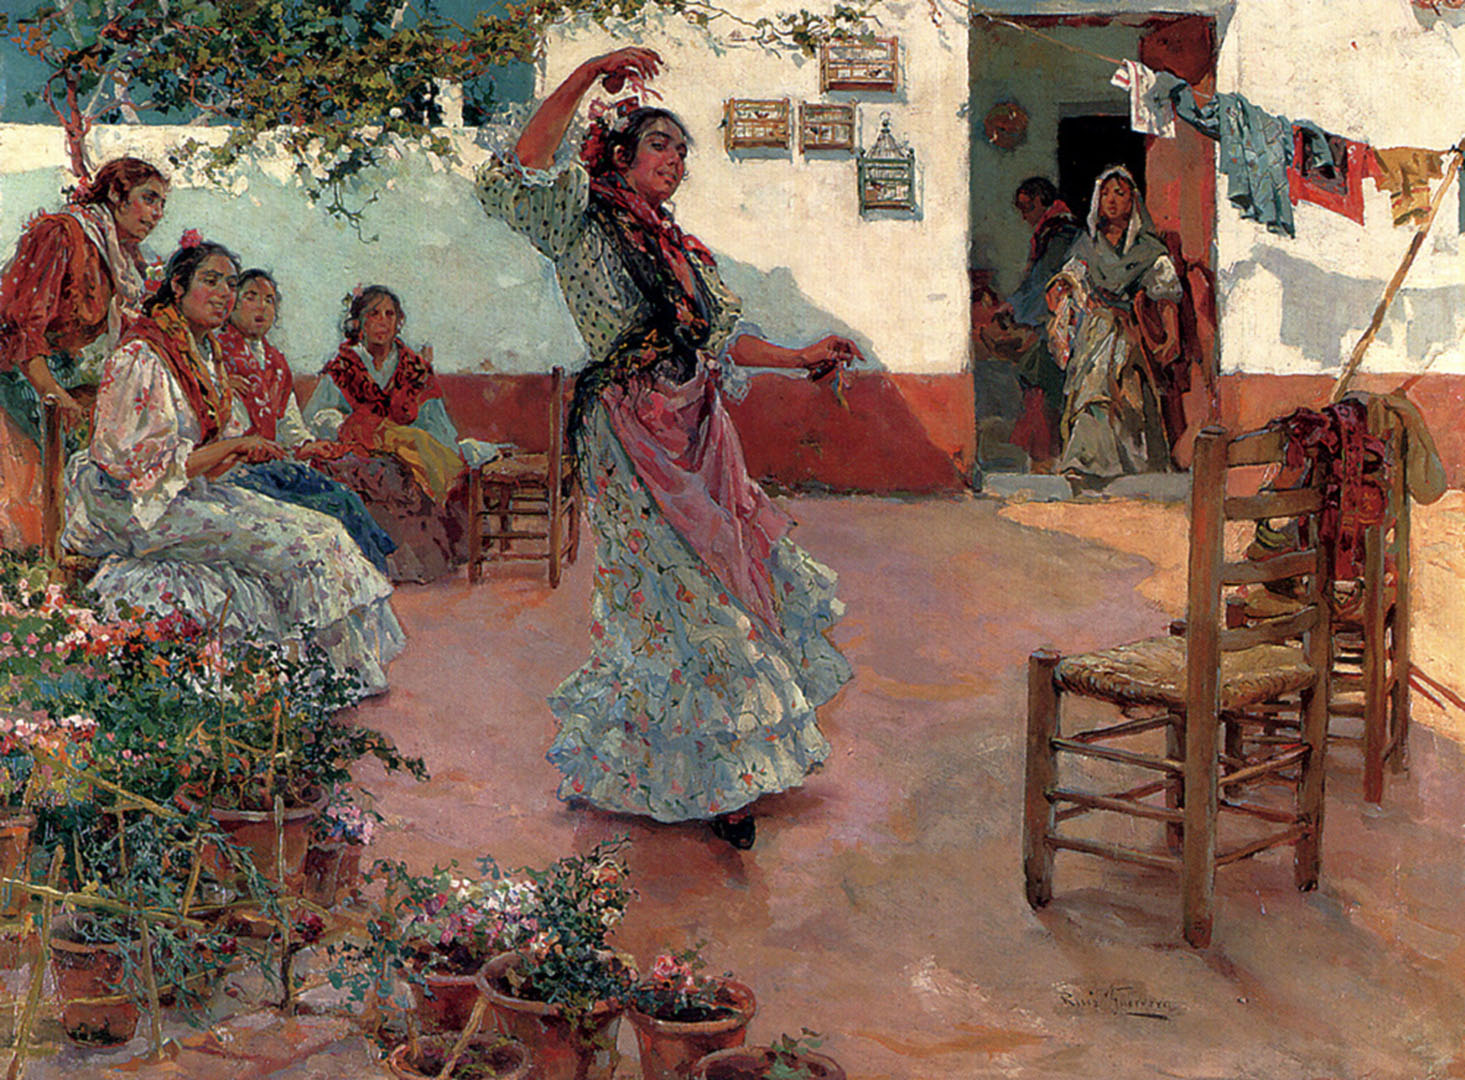 The Flamenco Dance